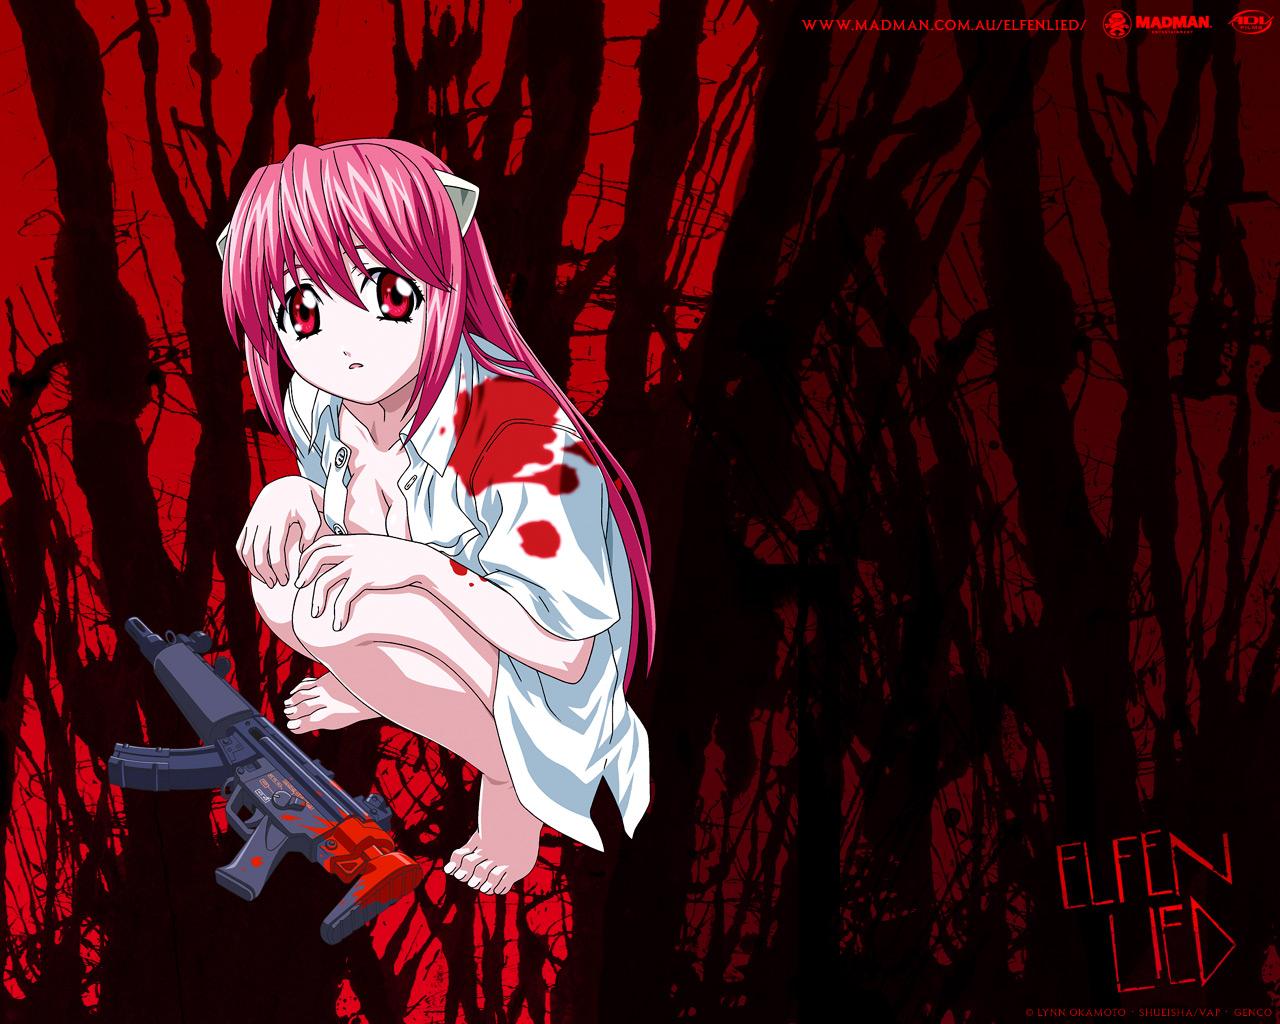 Periodismo en serie los animes m s gore for Imagenes de anime gore